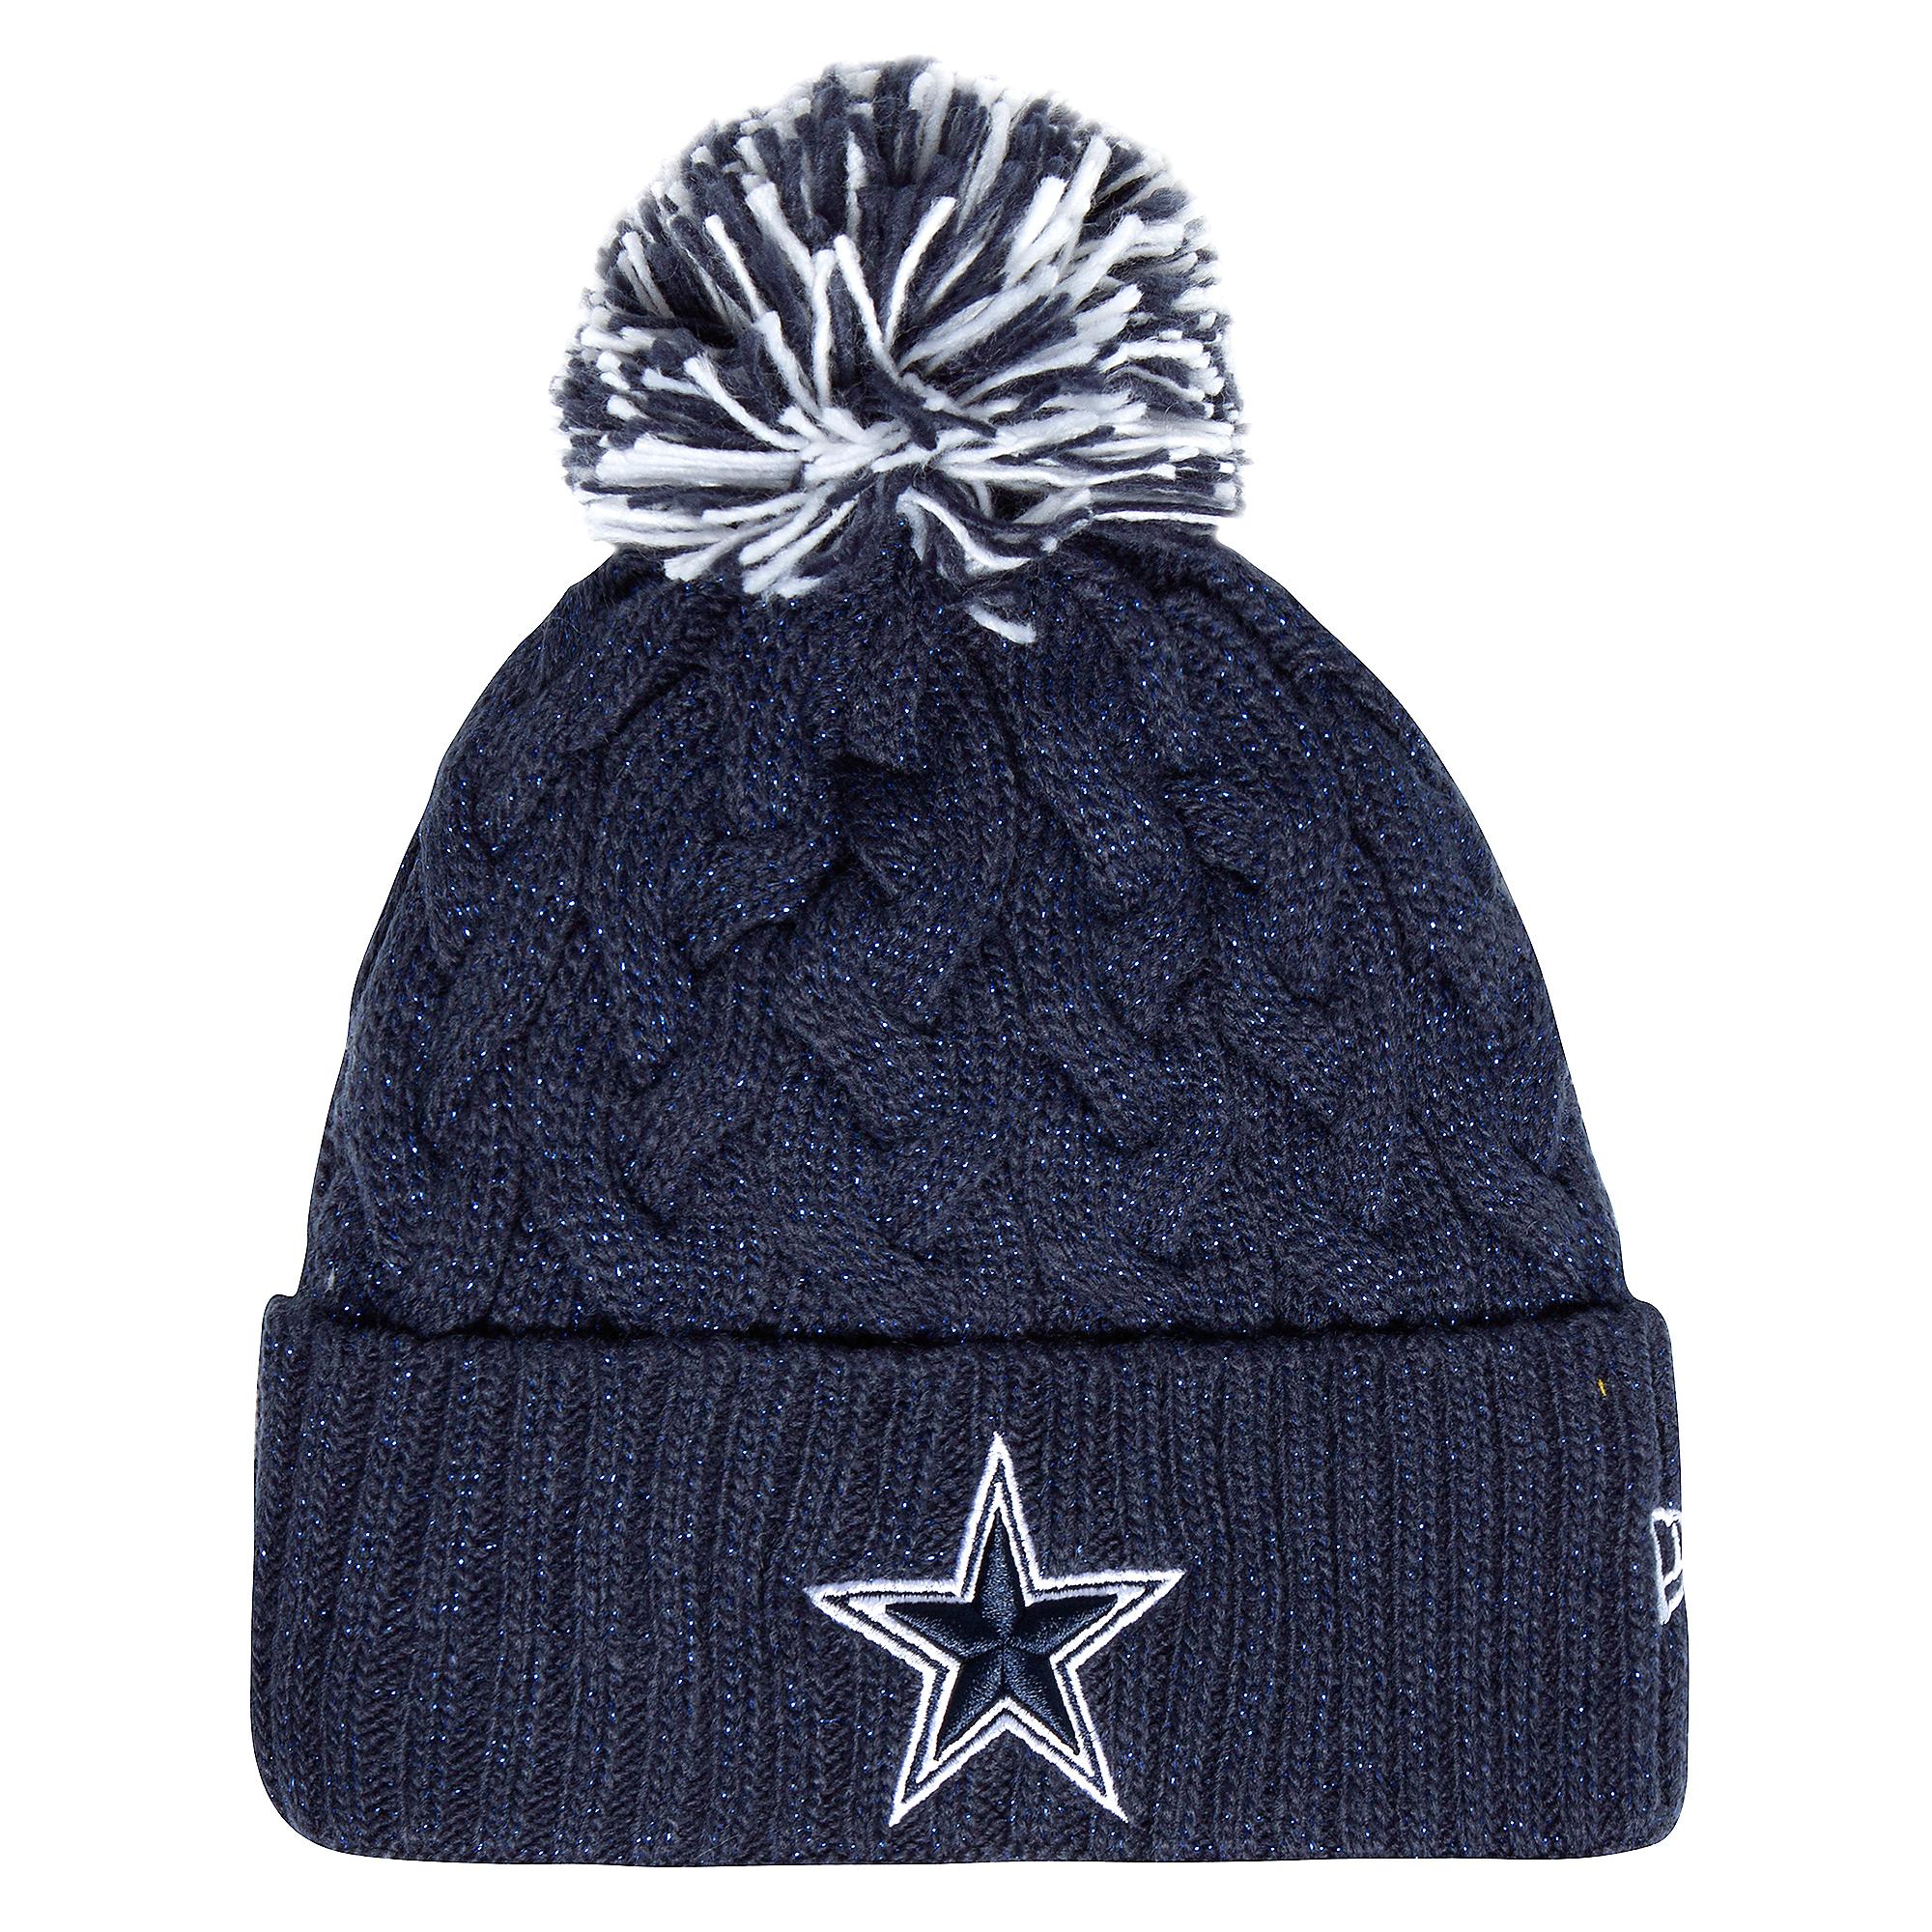 Dallas Cowboys New Era Womens Cozy Cable Knit Hat